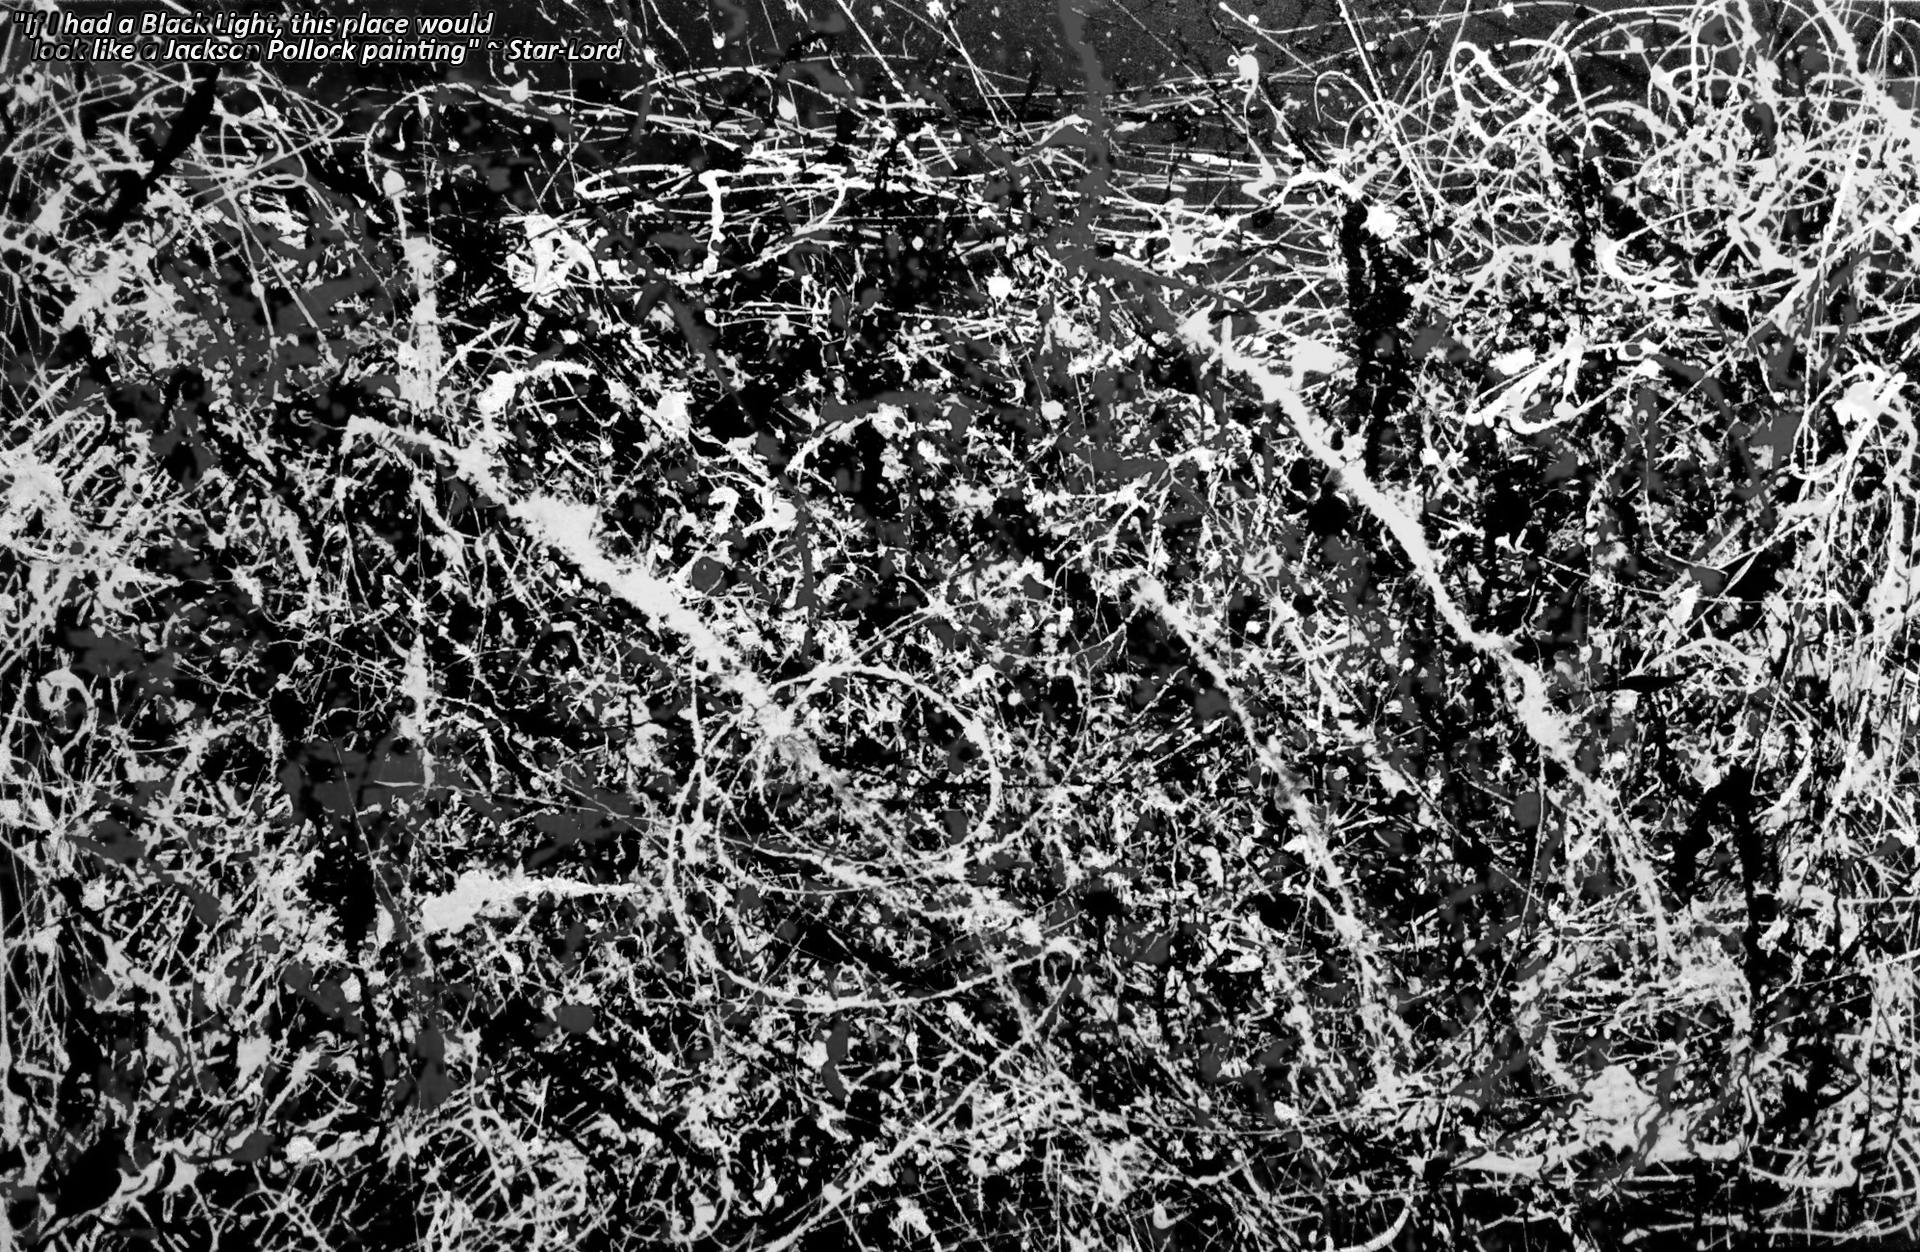 Star Lord Quote   Desktop Background   Jackson Pollock   Imgur 1920x1252